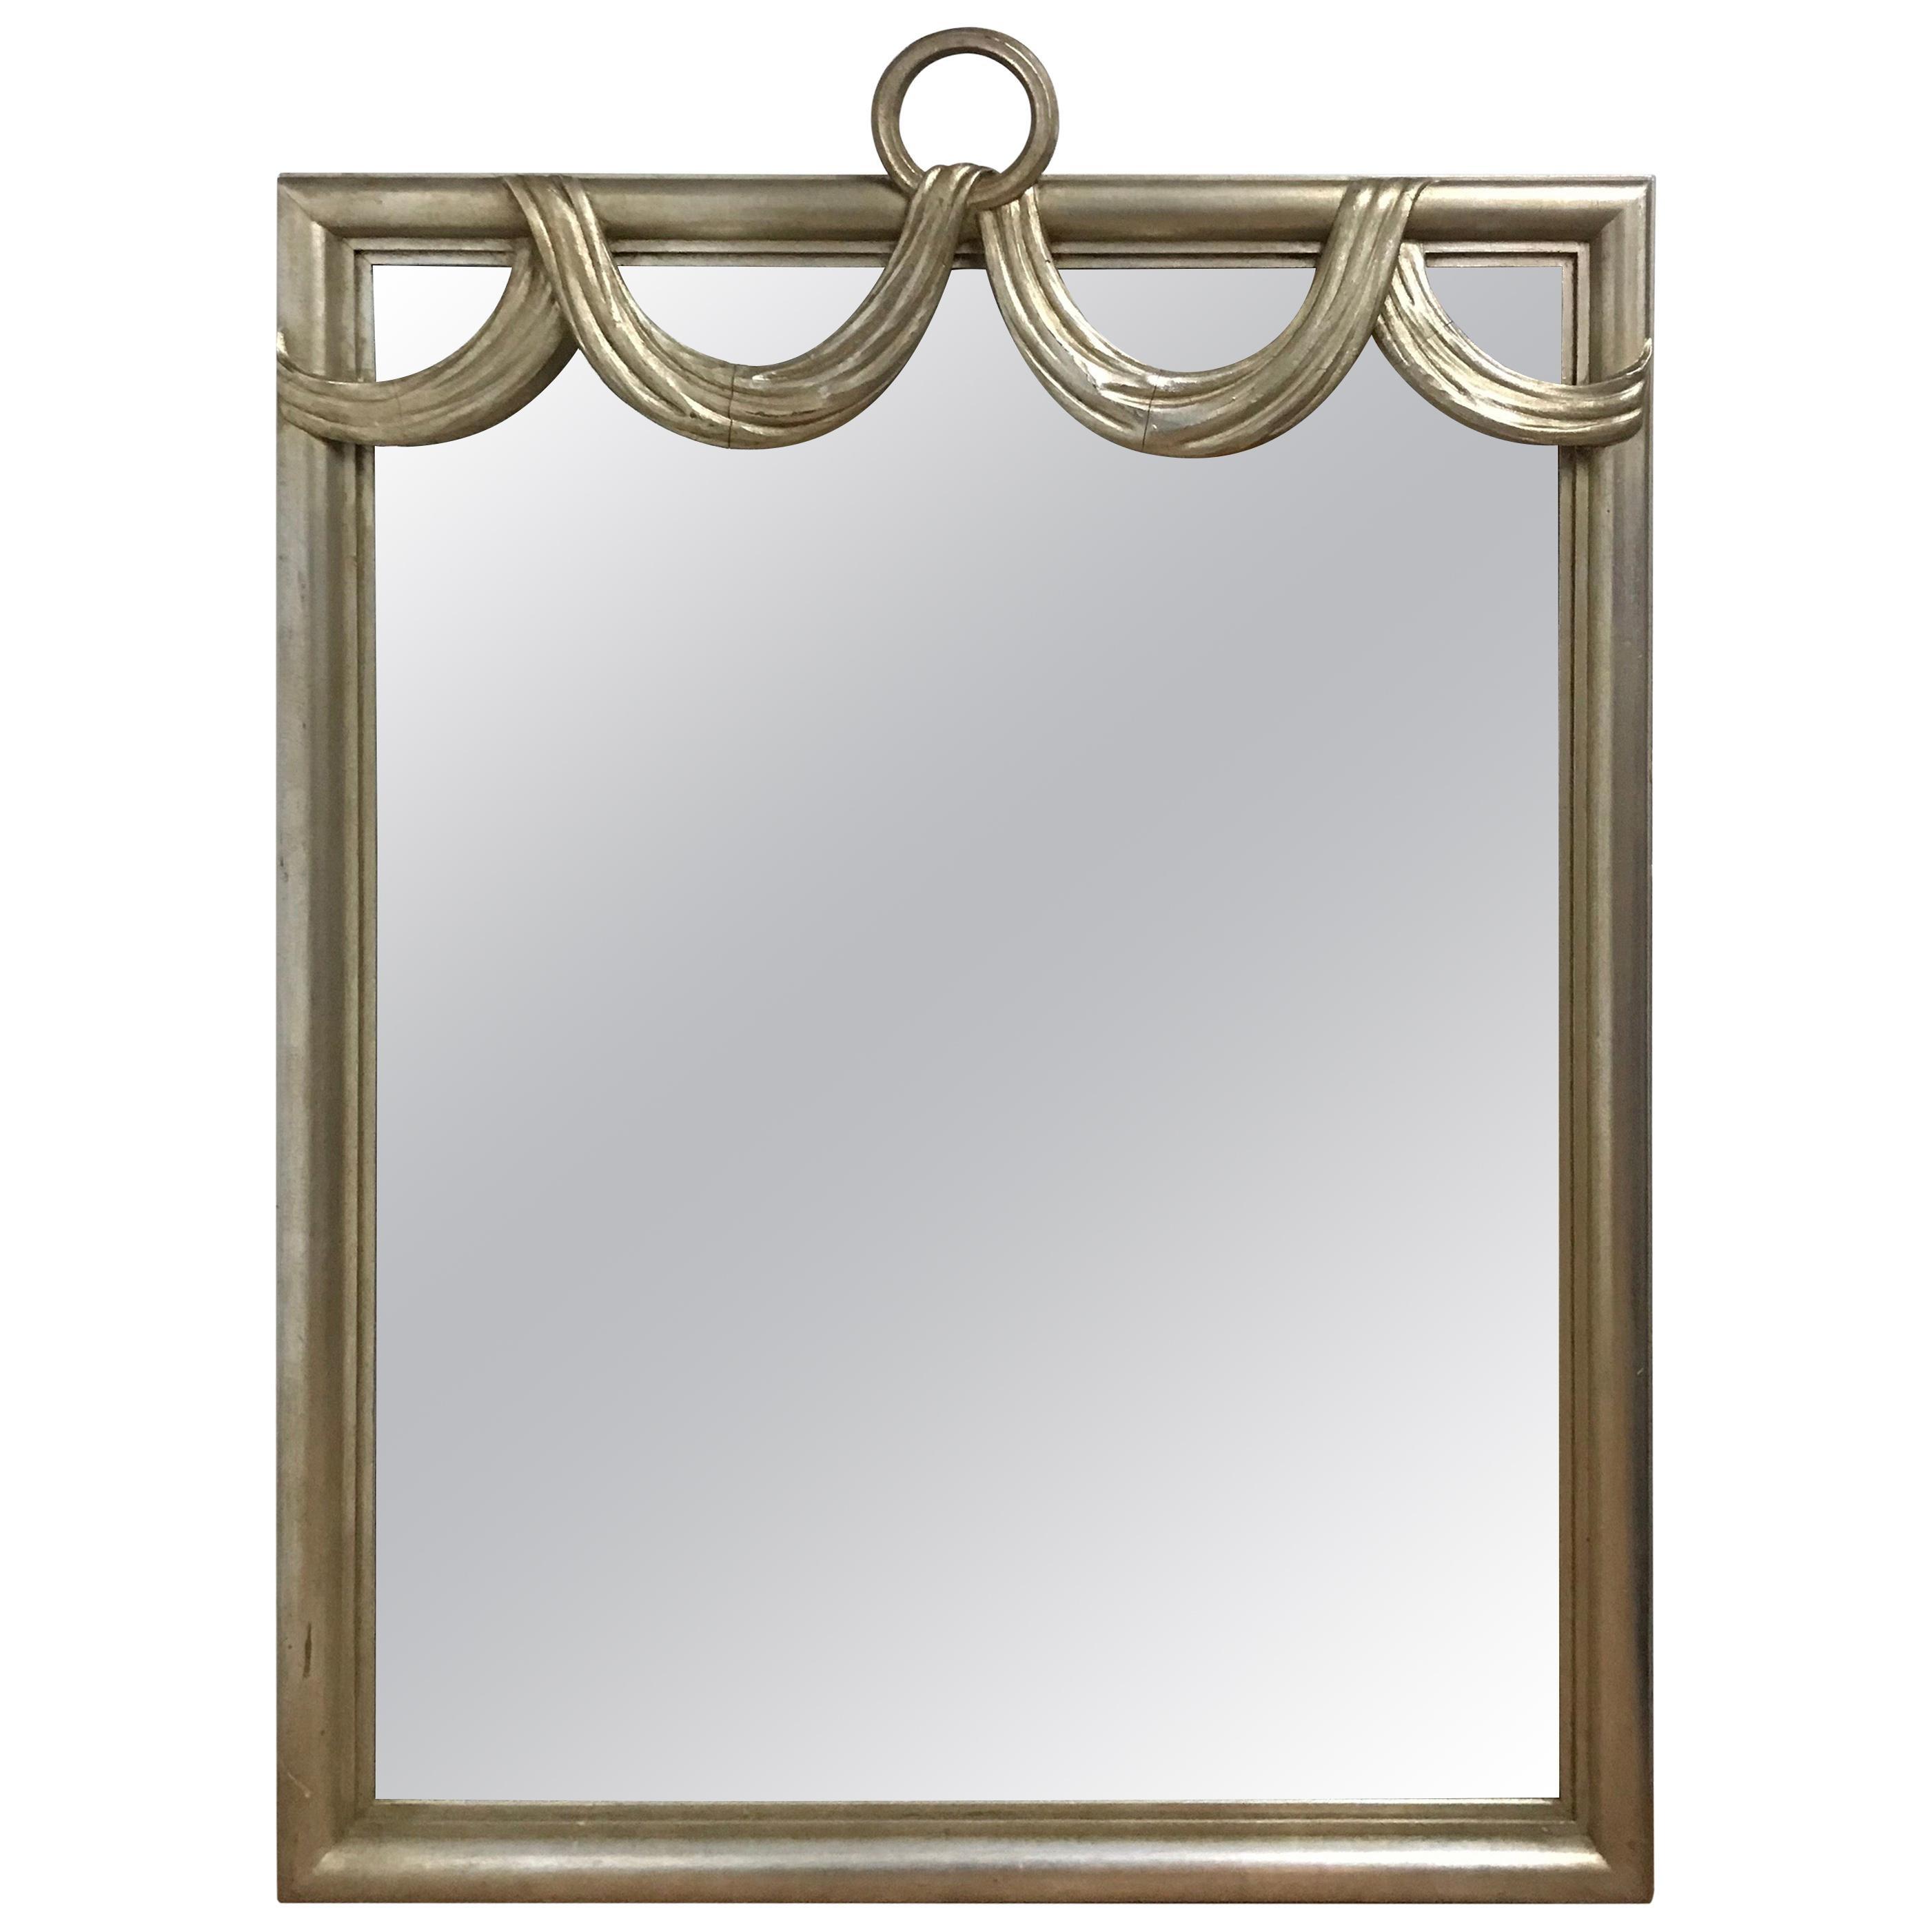 Hollywood Regency Style Giltwood Swag Mirror